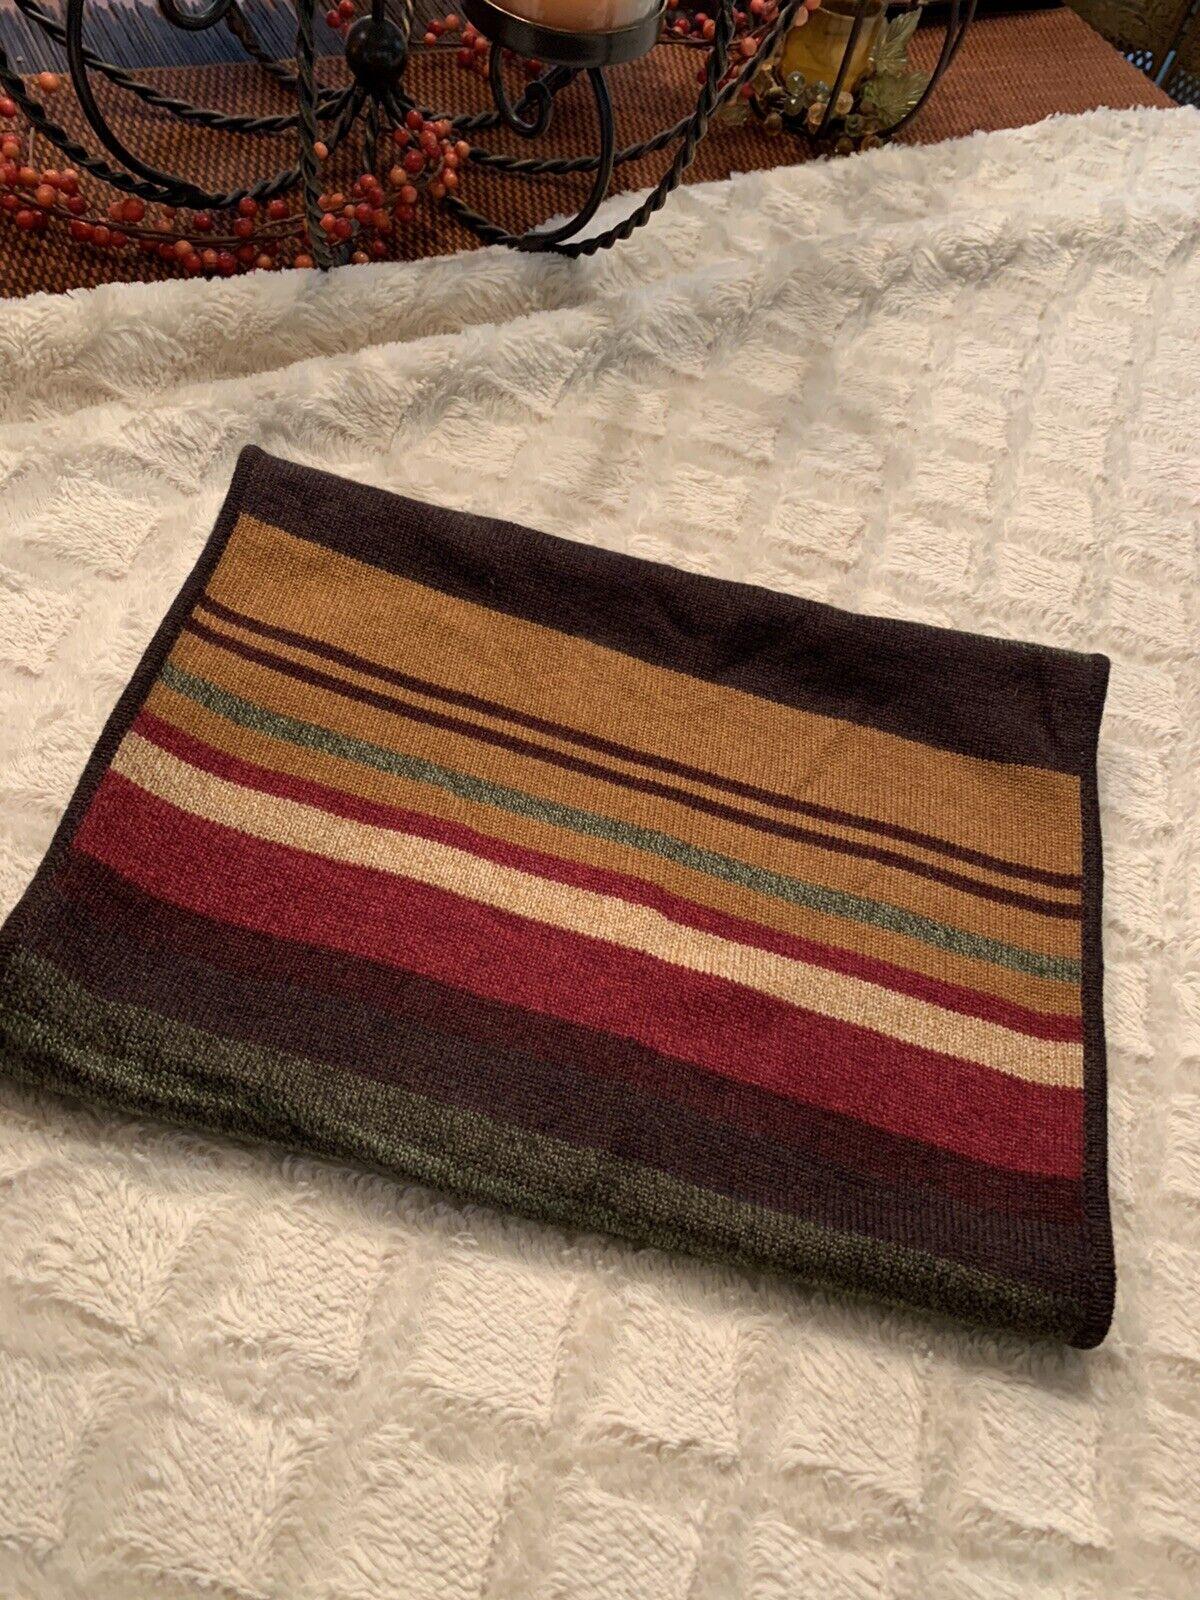 Oscar de la Renta Wool Neck Scarf Gray Brown Red Yellow Green Multi Stripe